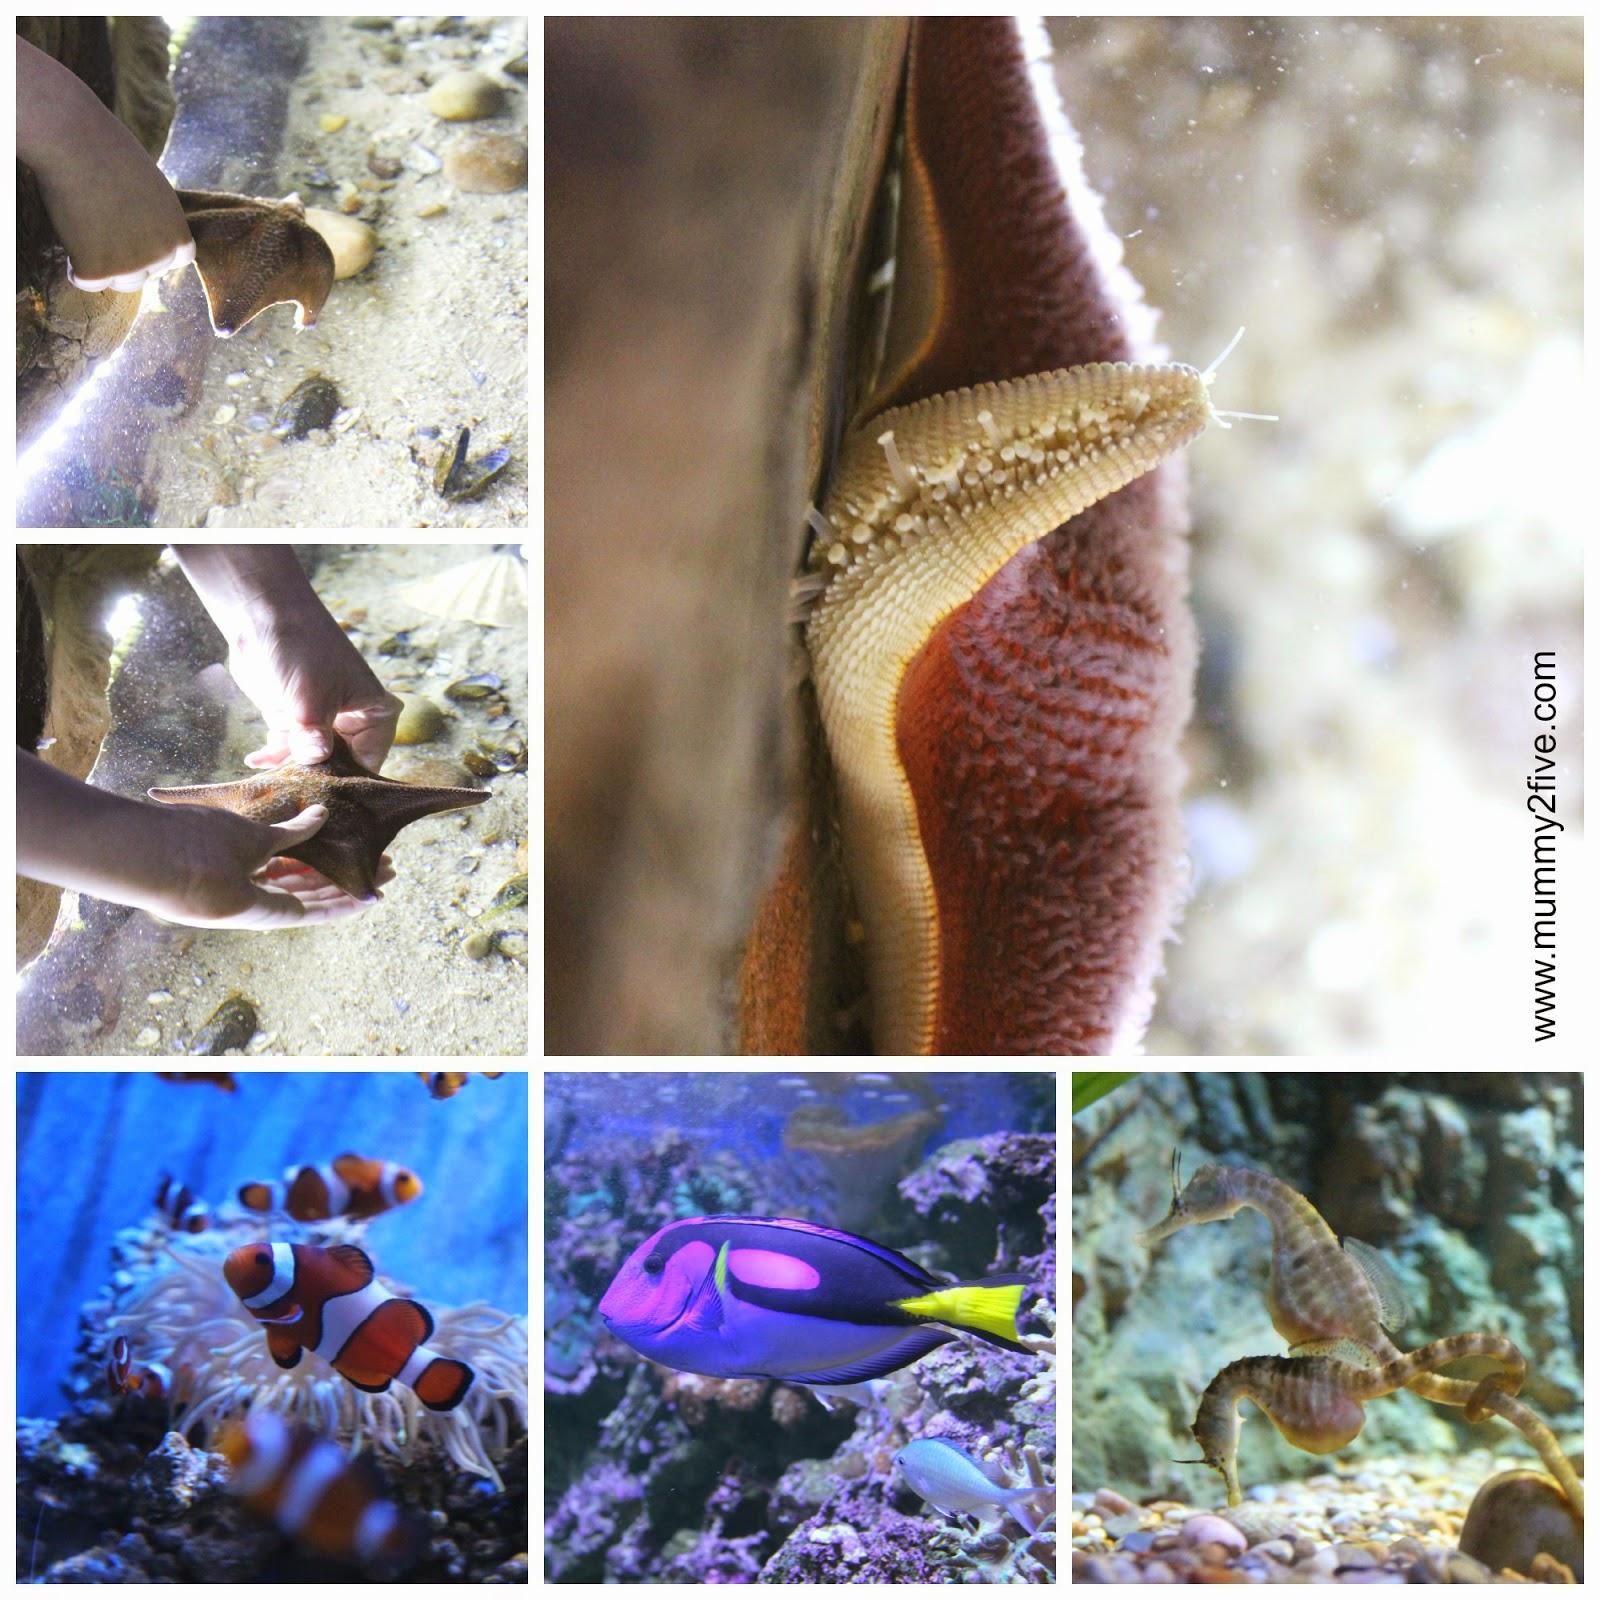 starfish, clownfish, regal tangs and seahorses